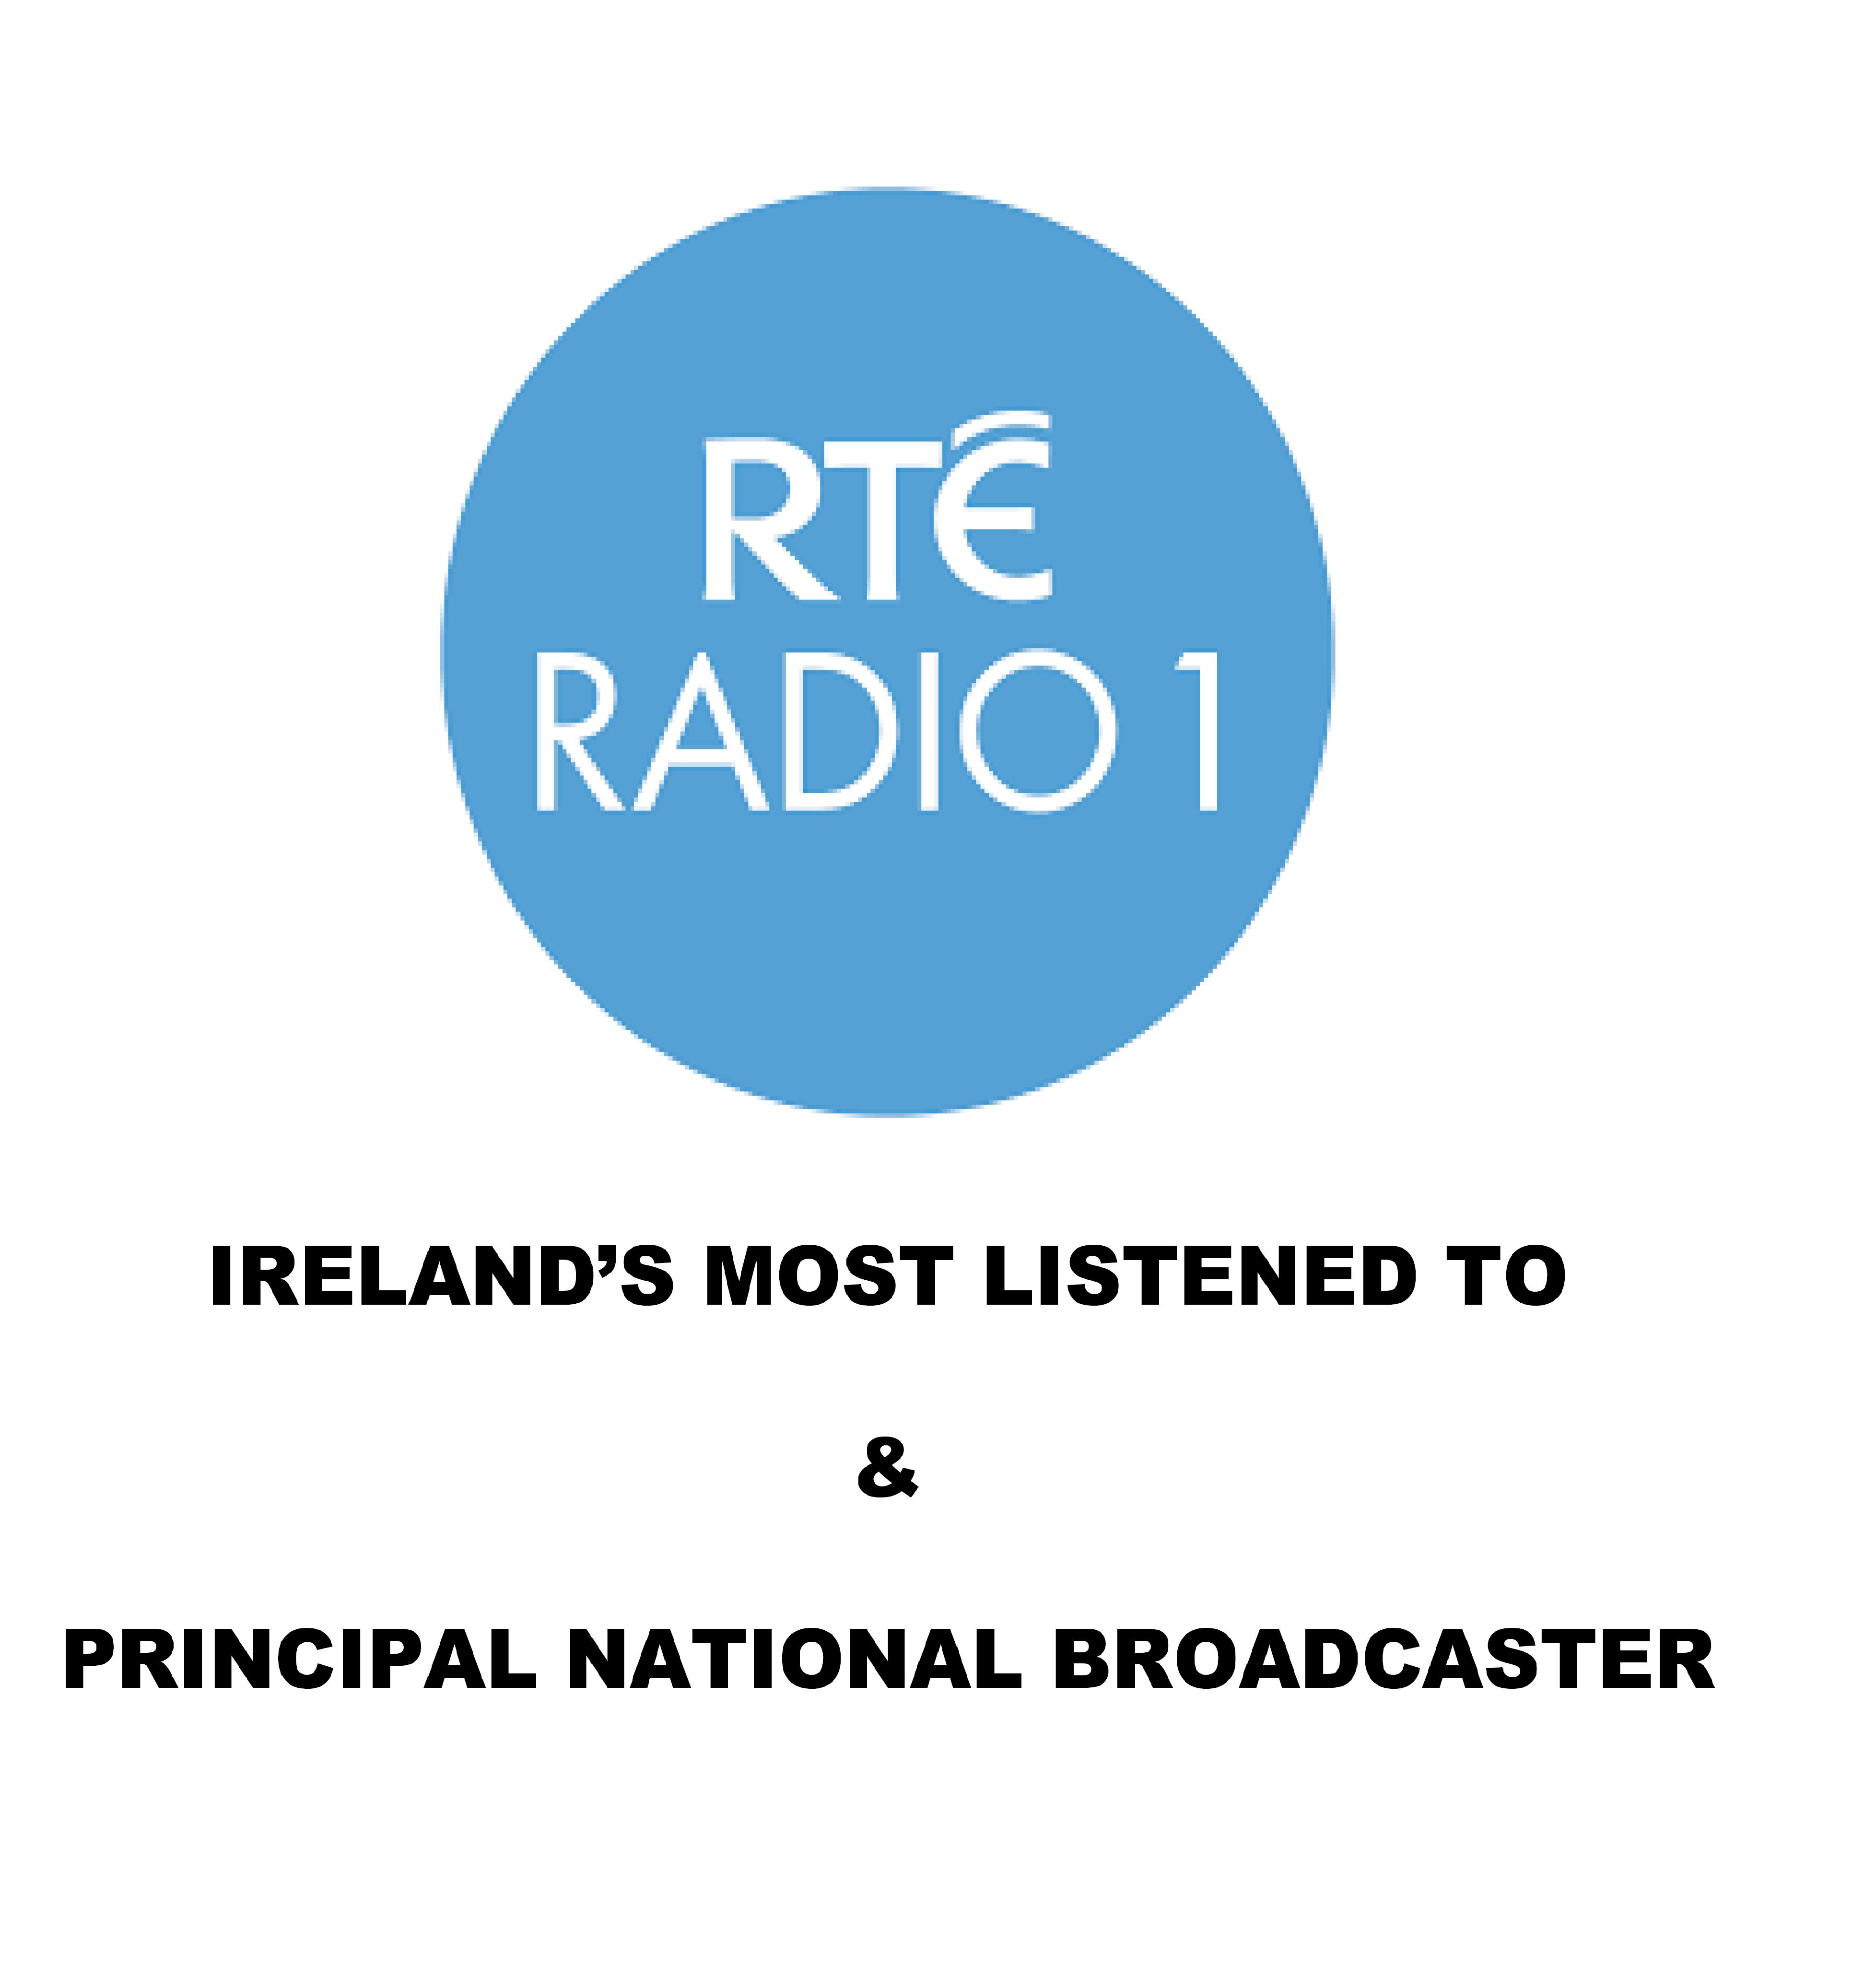 RTE logo and strapline